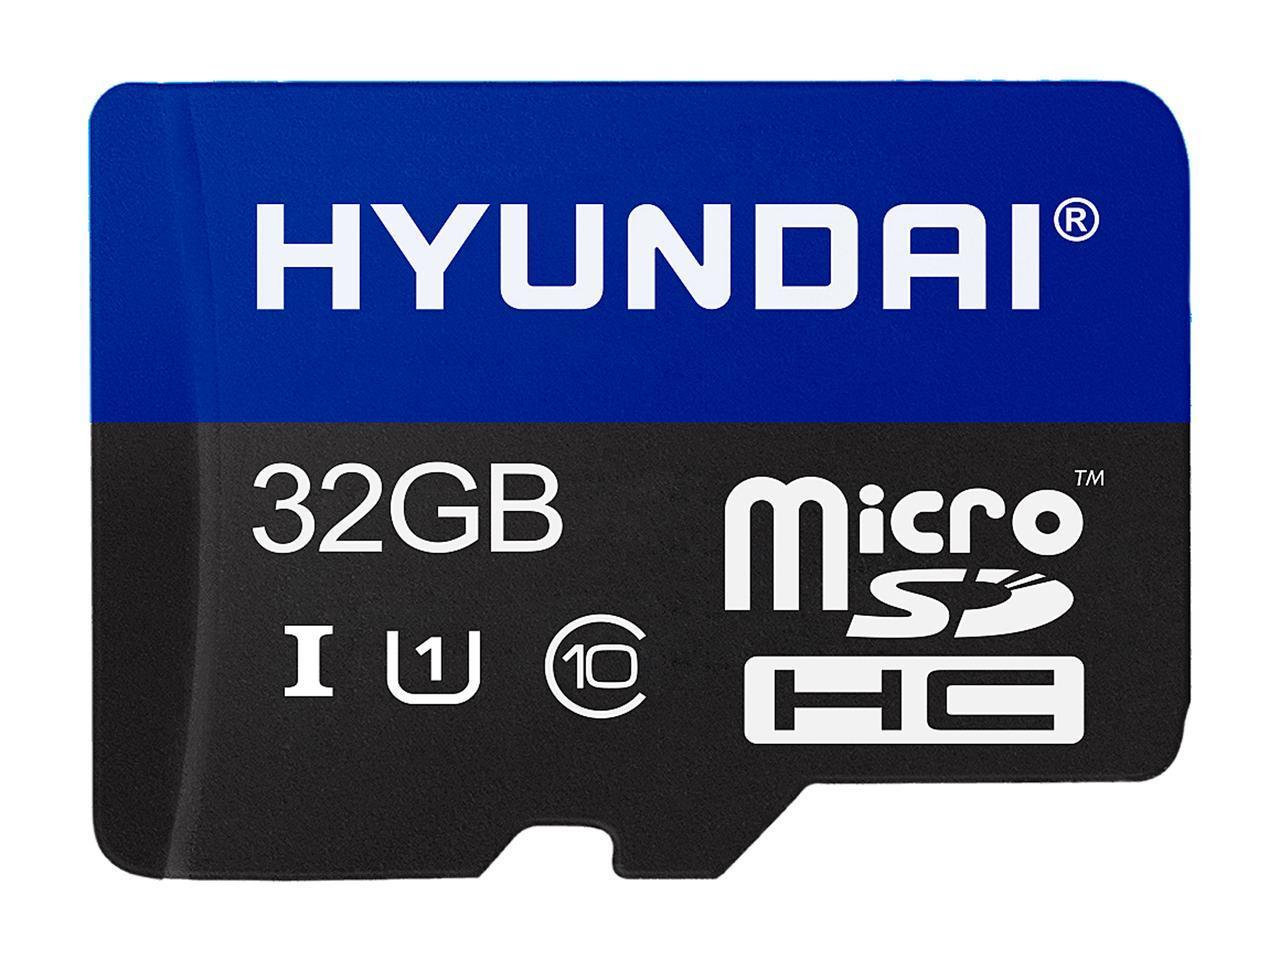 HYUNDAI 32GB Premier UHS-I microSD card (read/write: 90/30 MB/s) $4.99 + FS